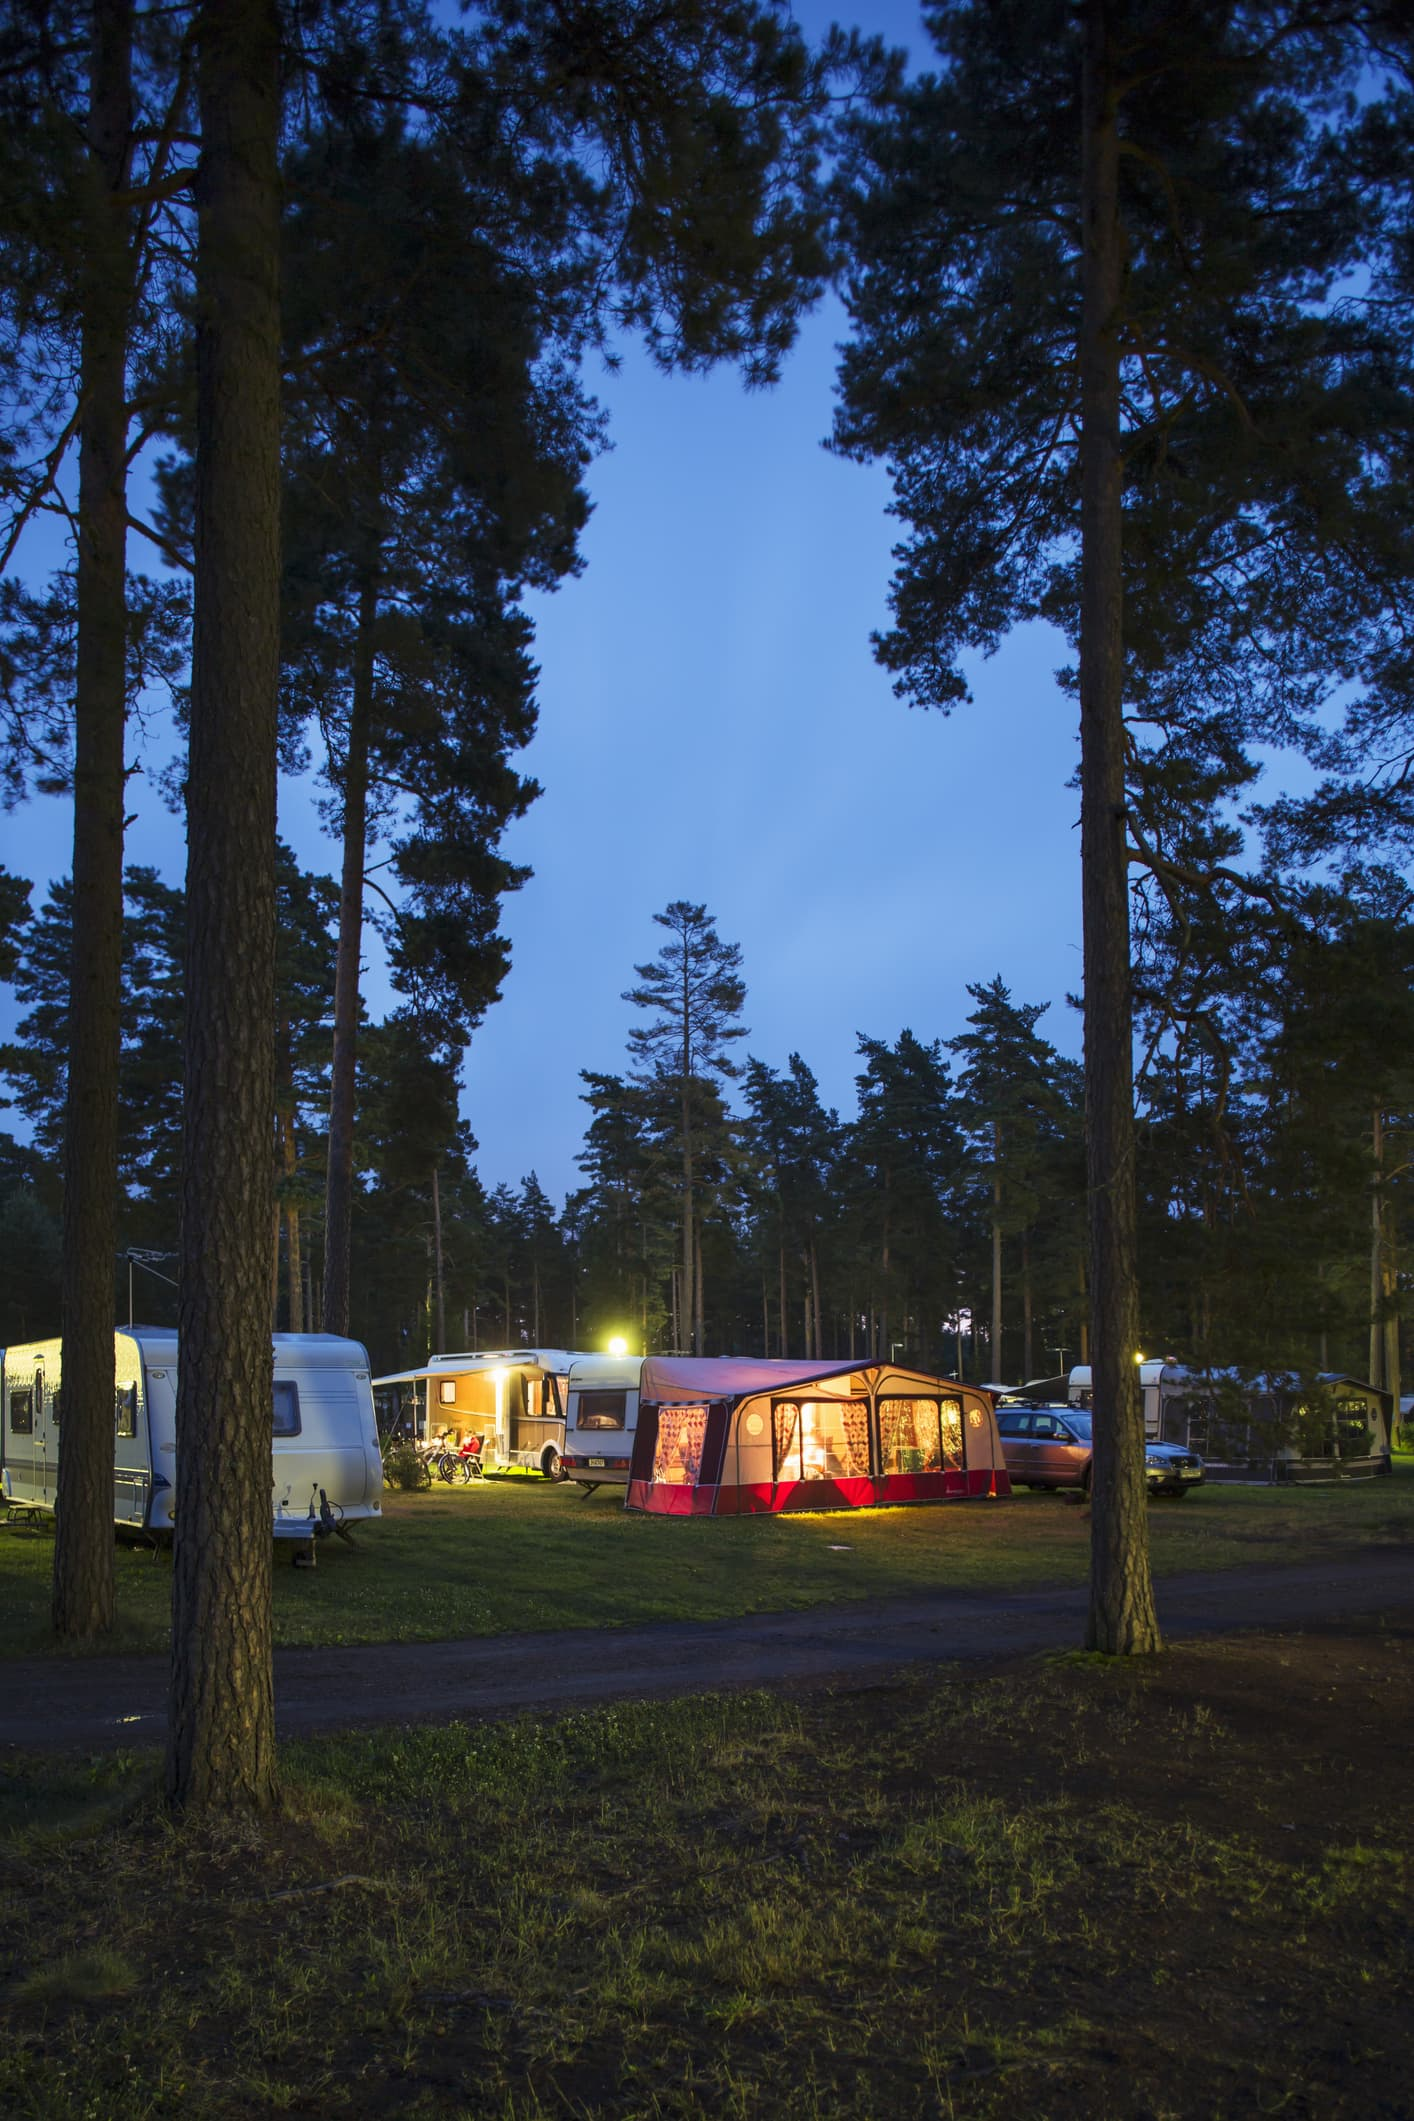 Campground at night